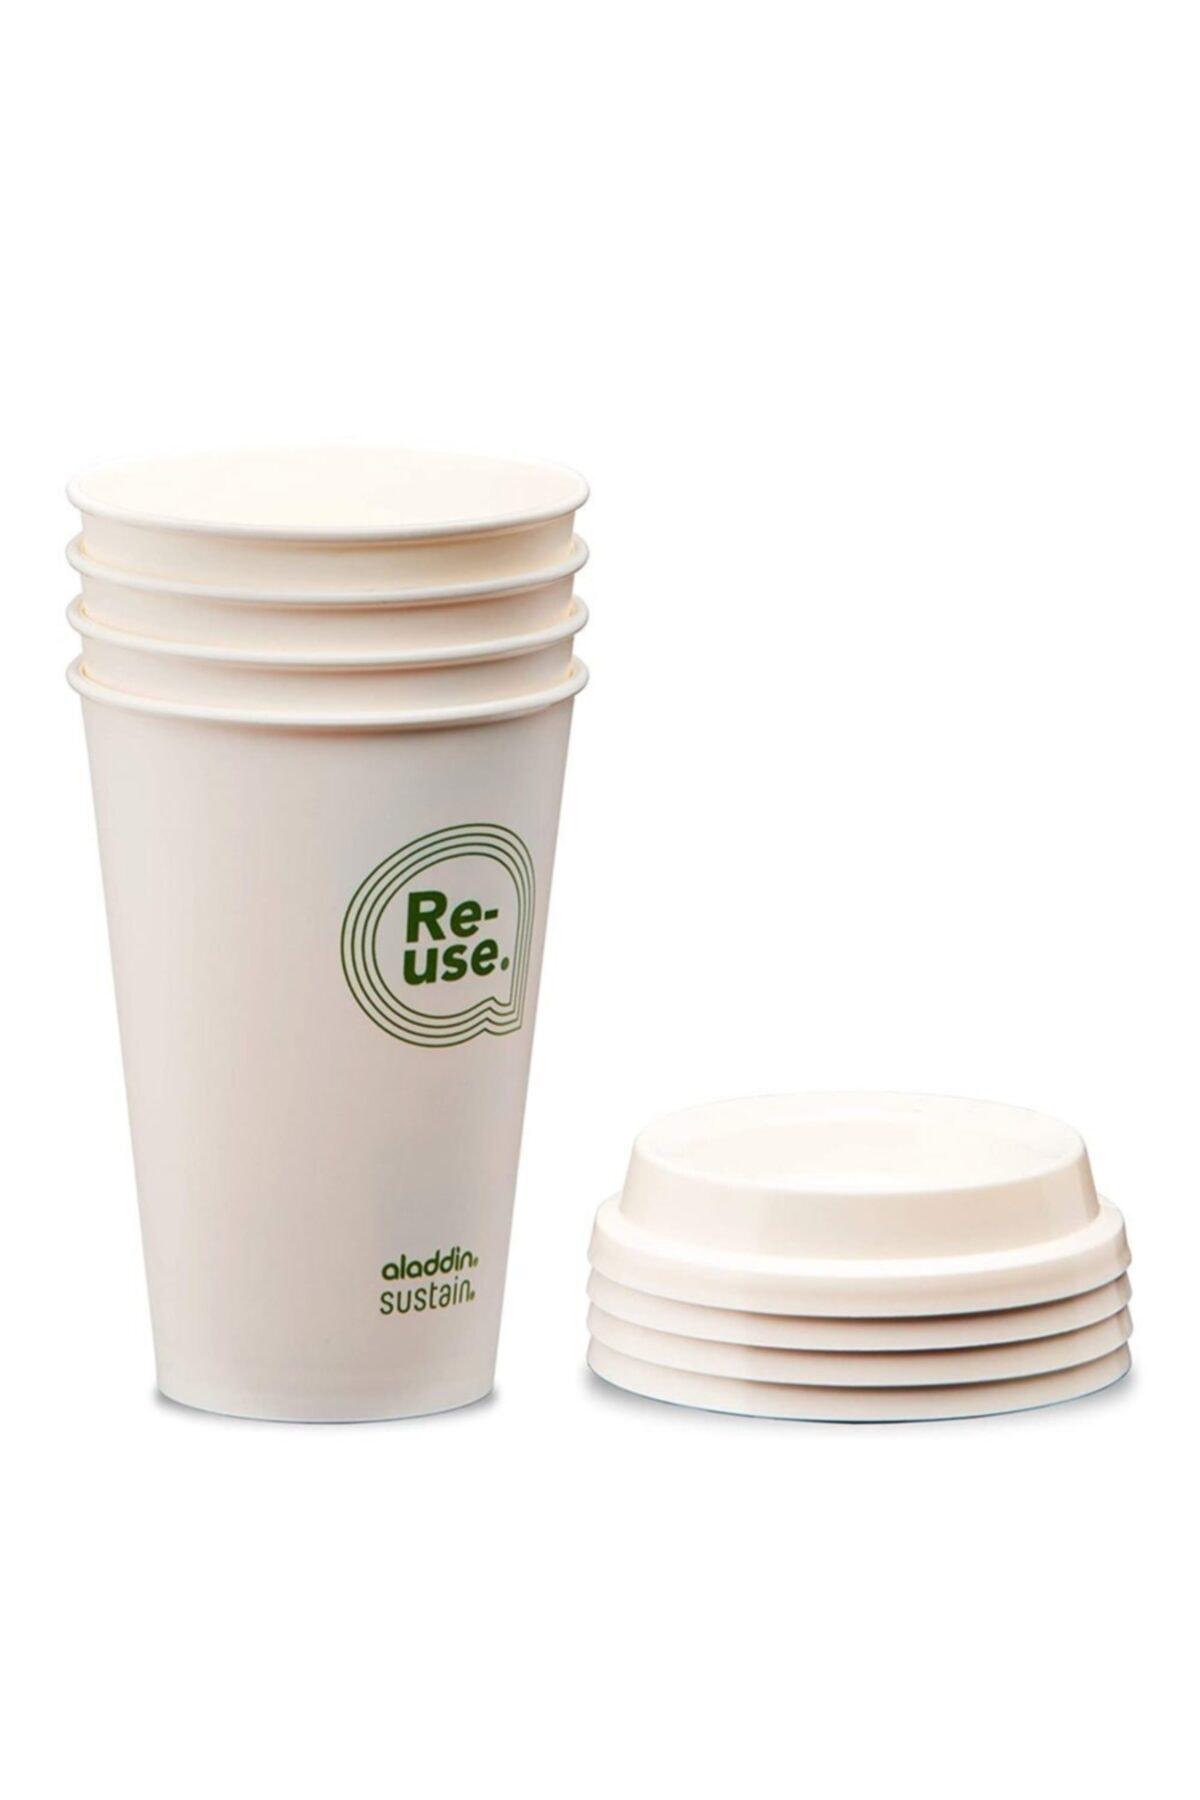 Aladdin Re-use Sustain Cup & Lid 0,35 lt 4lü Paket 1